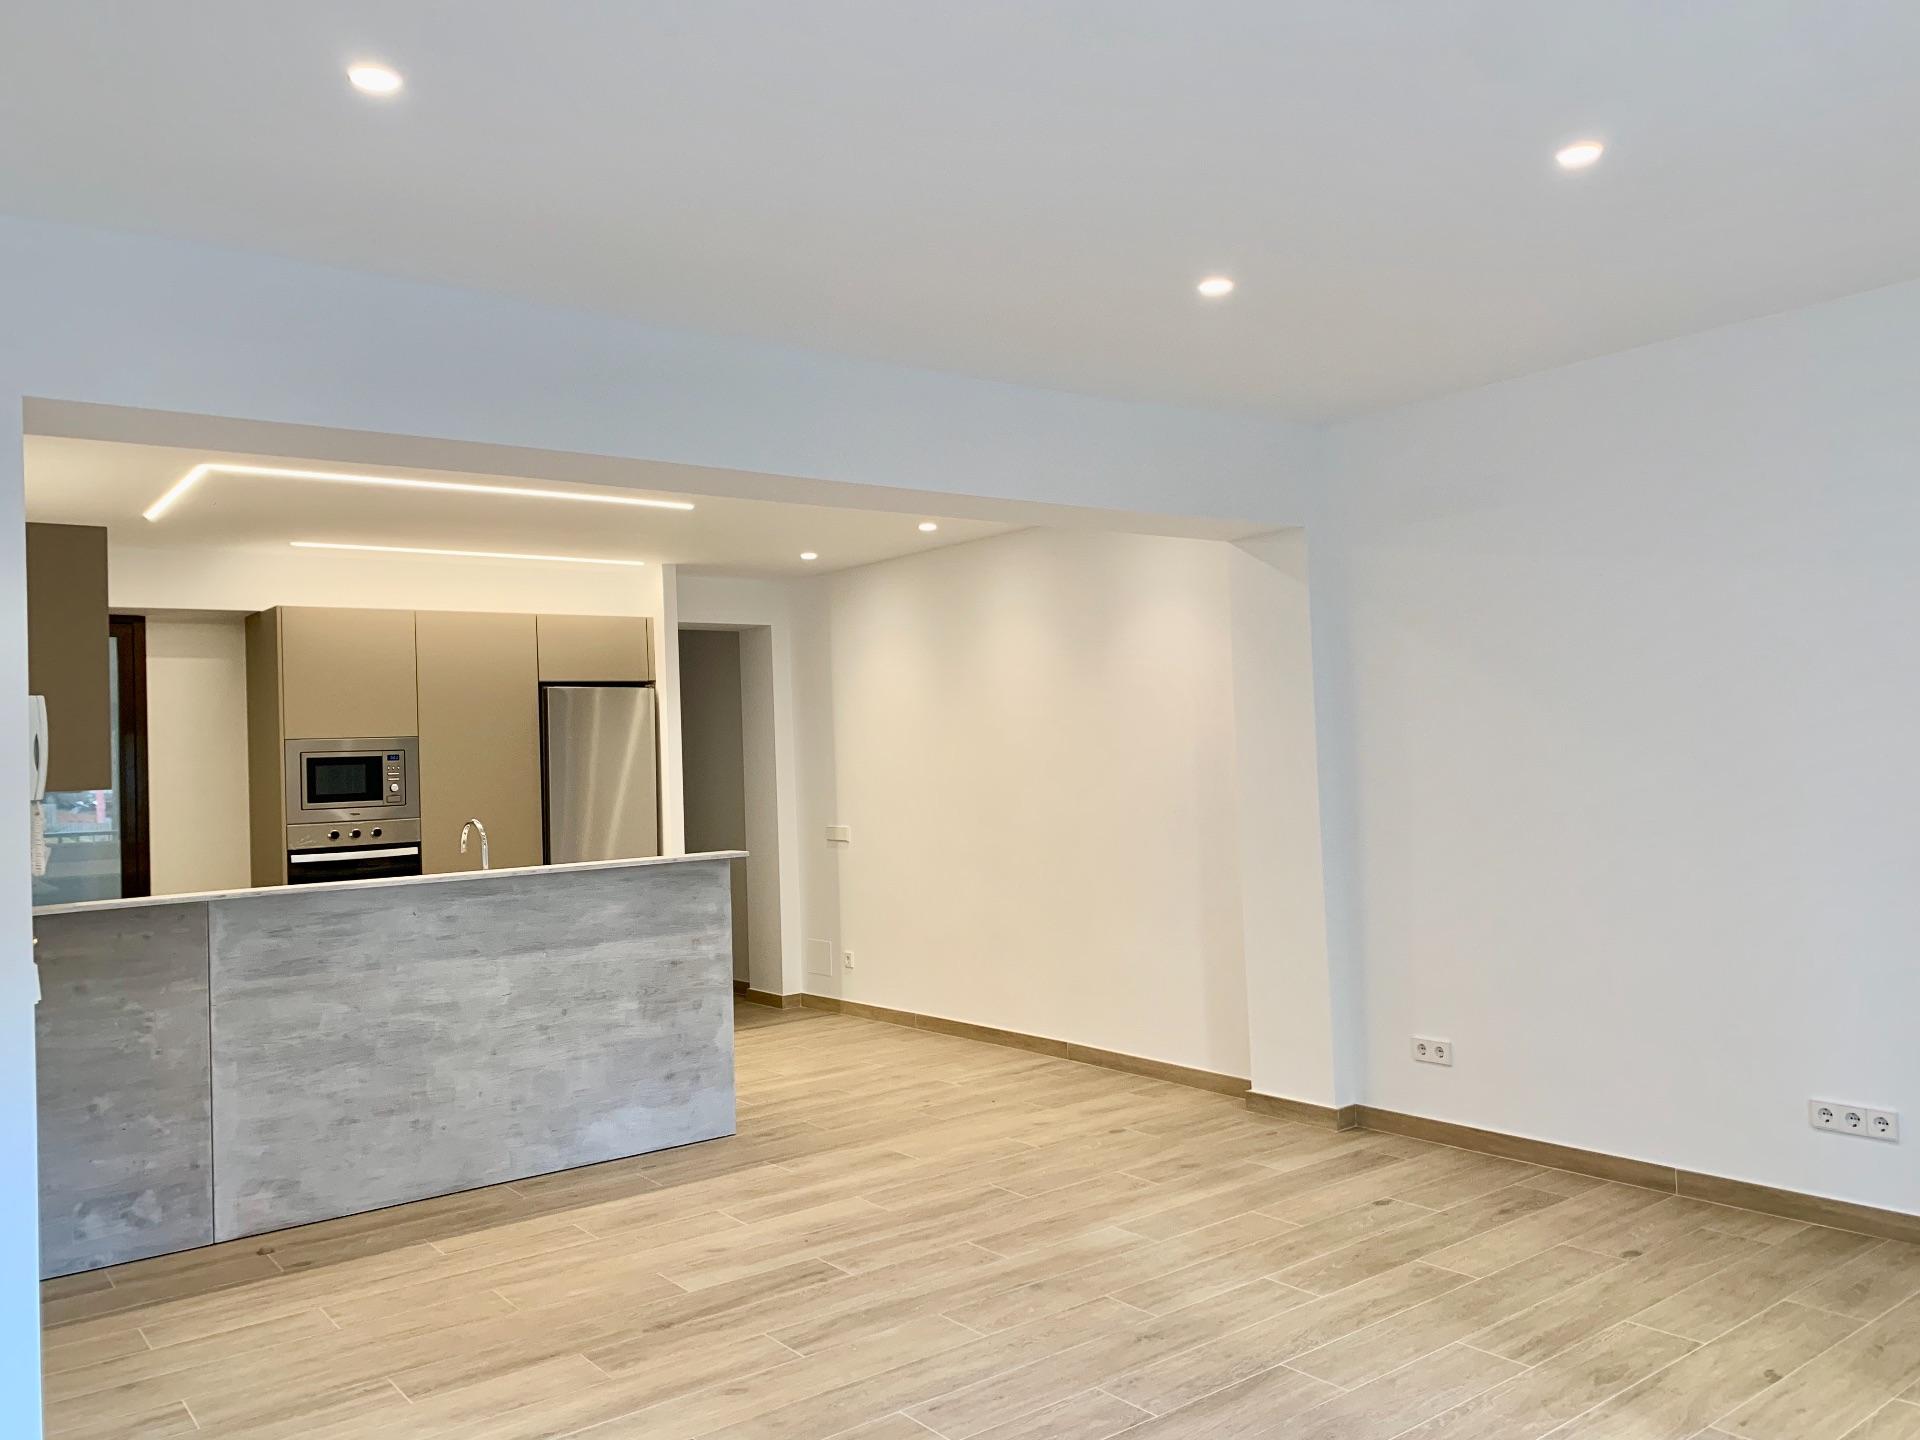 Apartment in Calpe / Calp, CENTRO, for rent